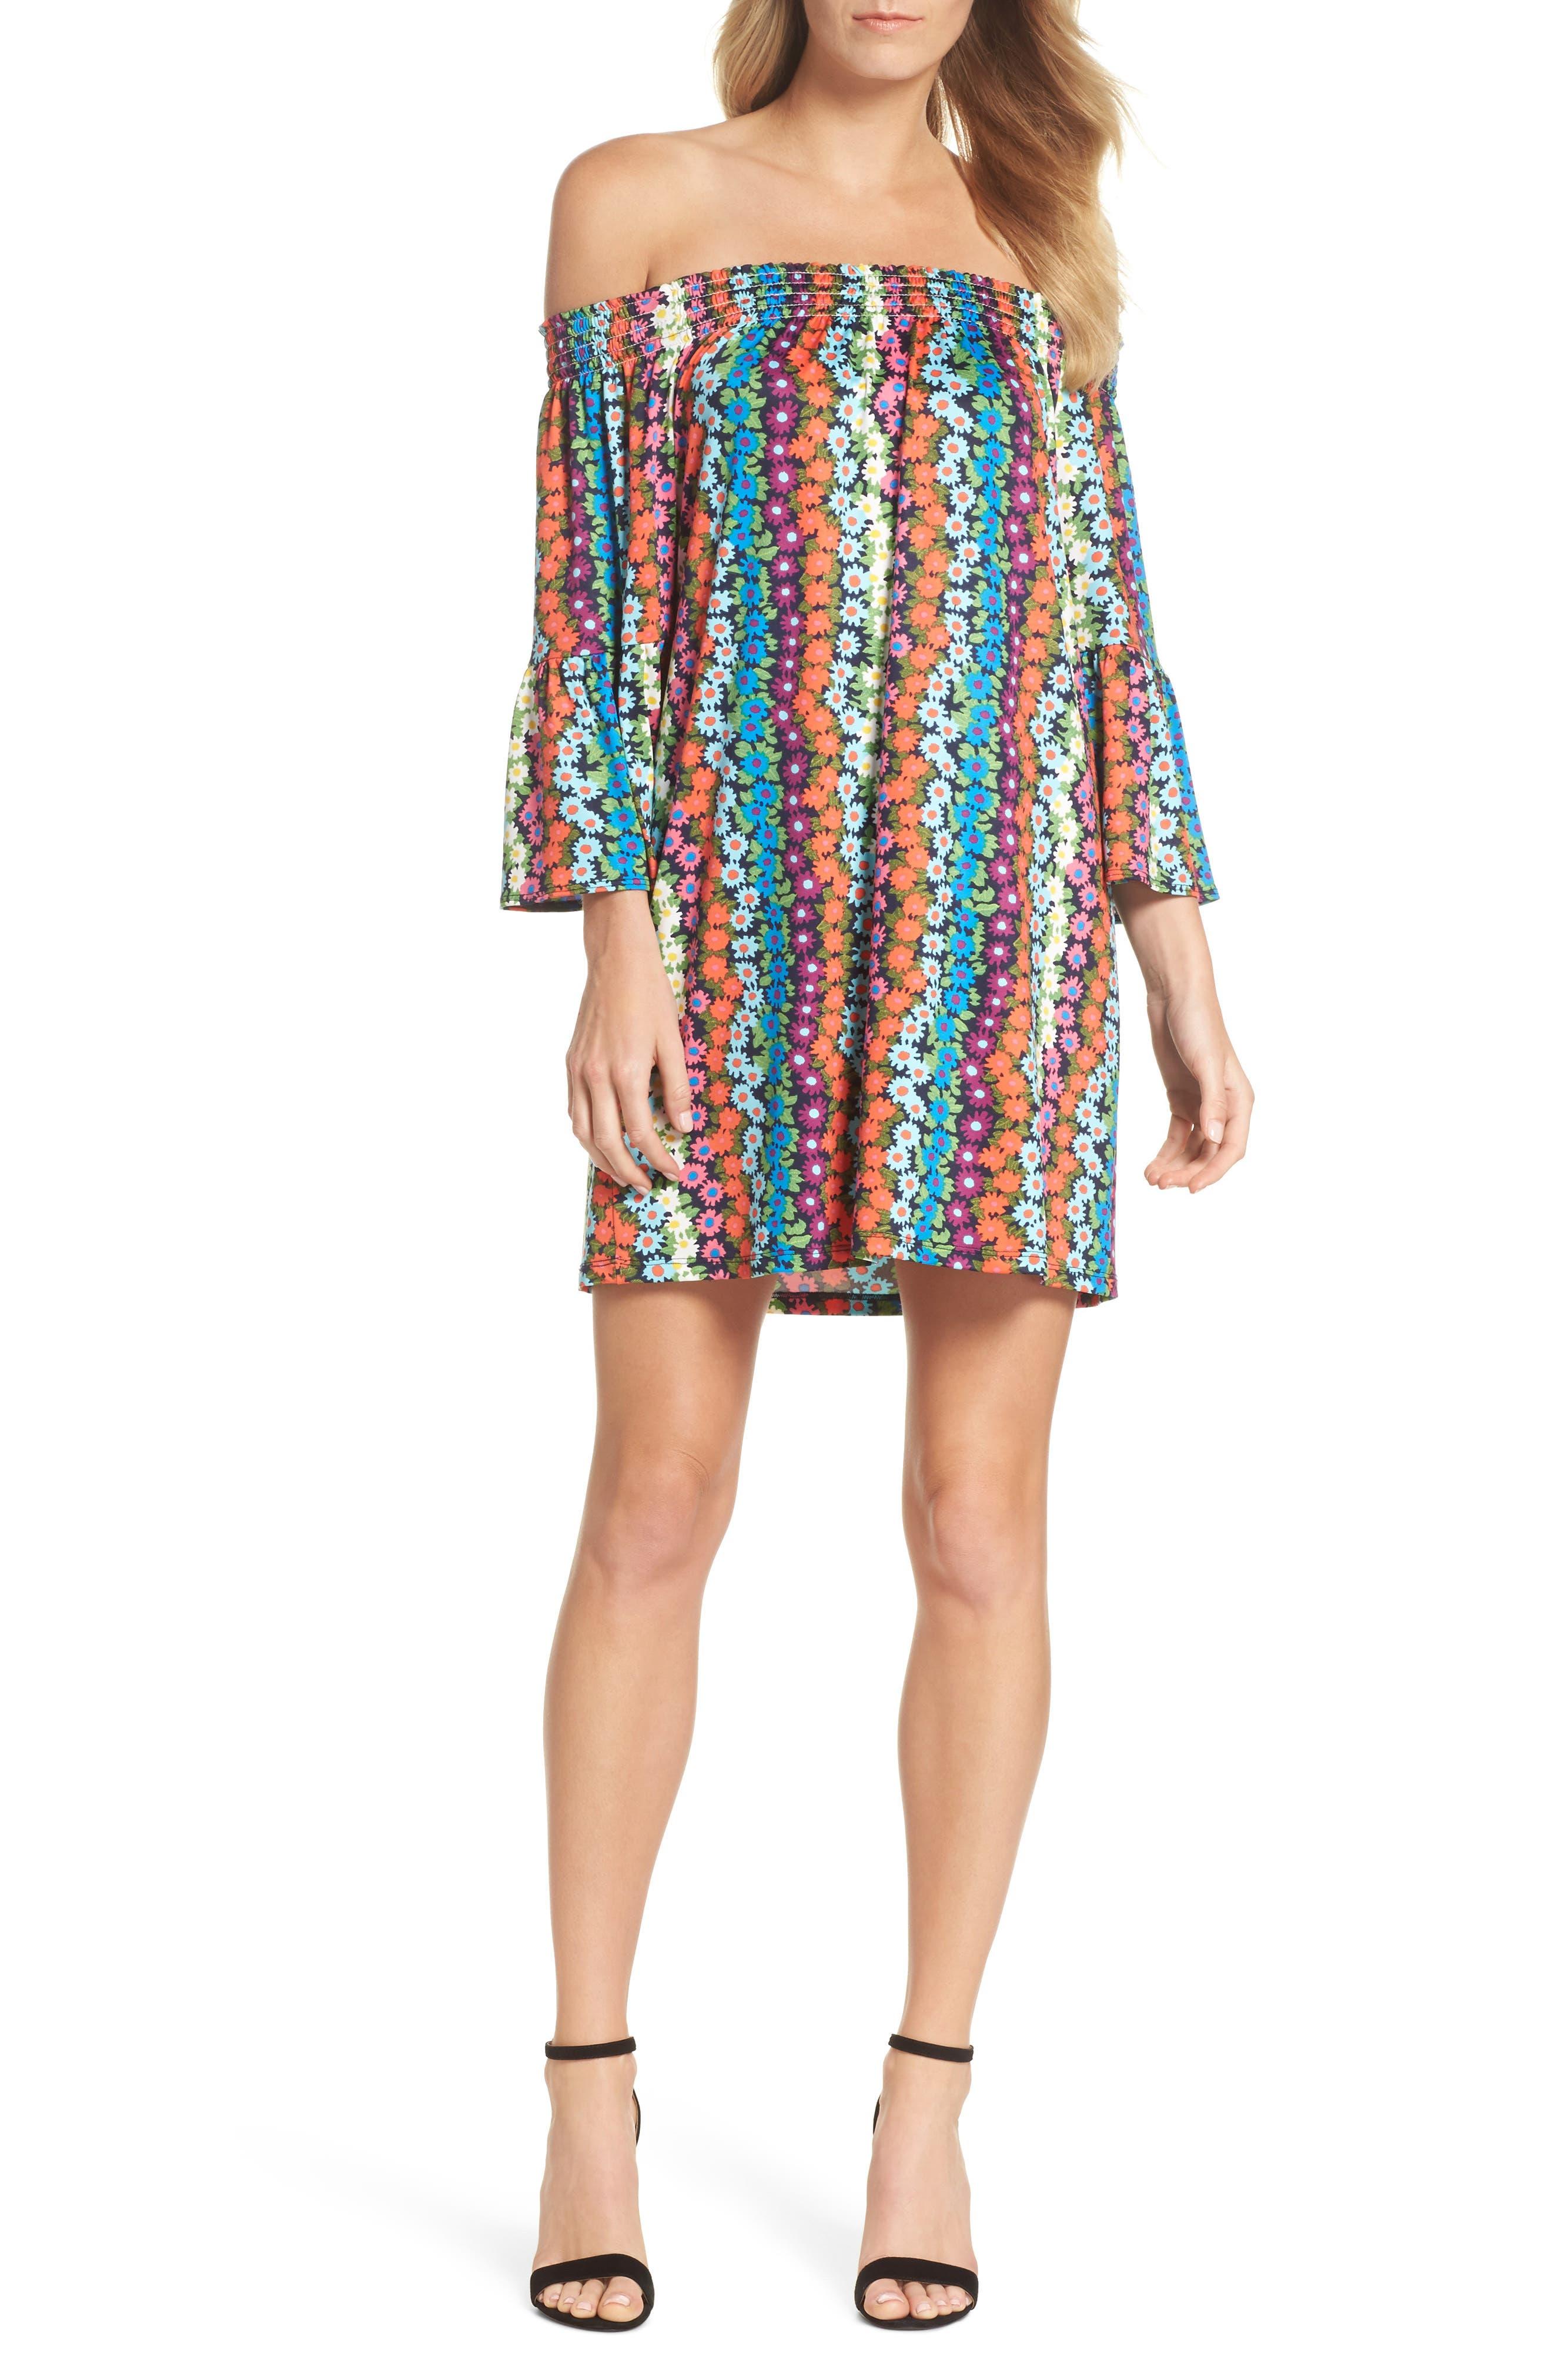 Trina Turk Off the Shoulder Bell Sleeve Dress,                         Main,                         color, Multi